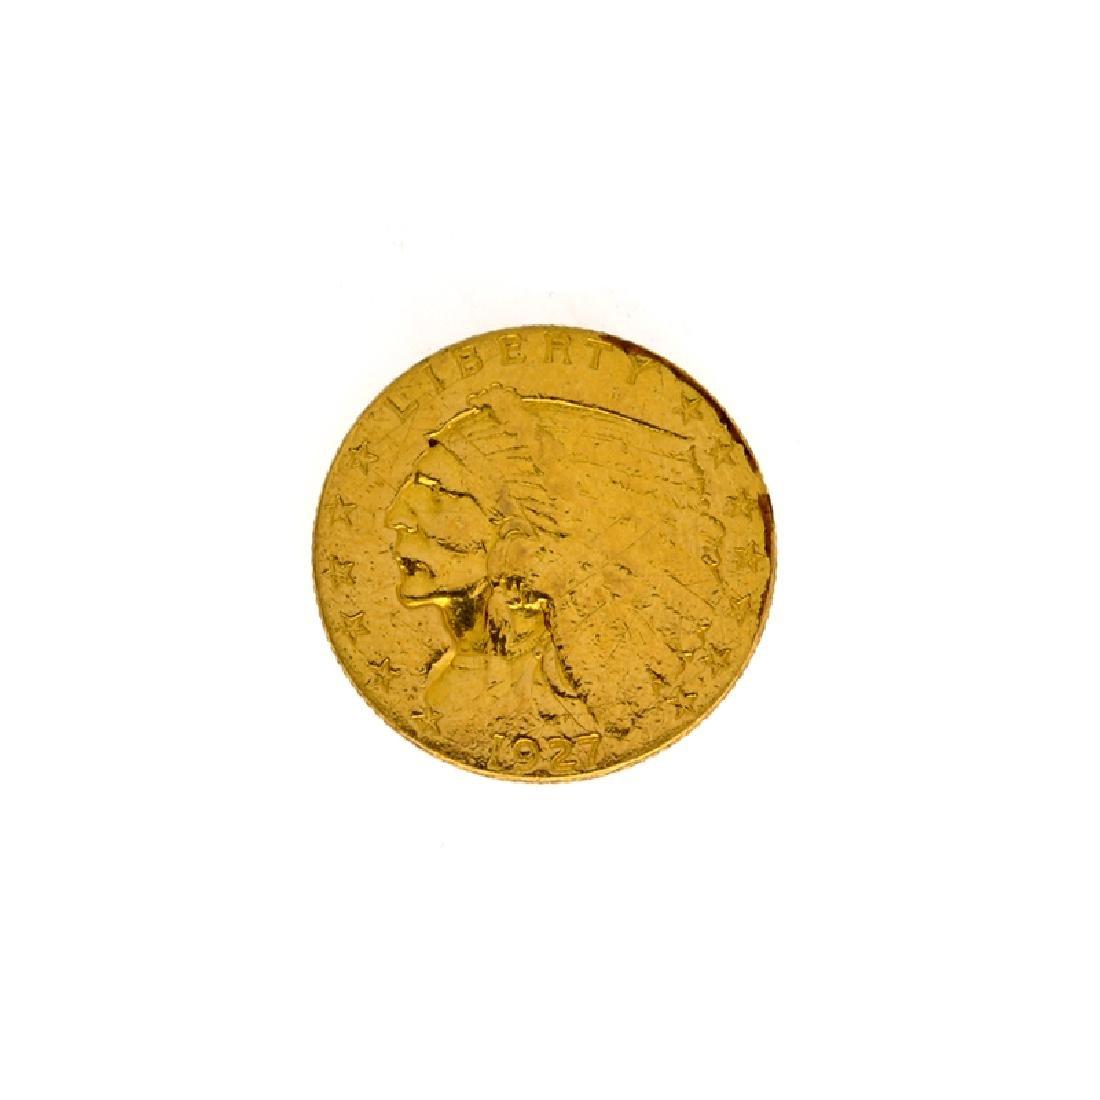 *1927 $2.50 U.S. Indian Head Gold Coin (DF)